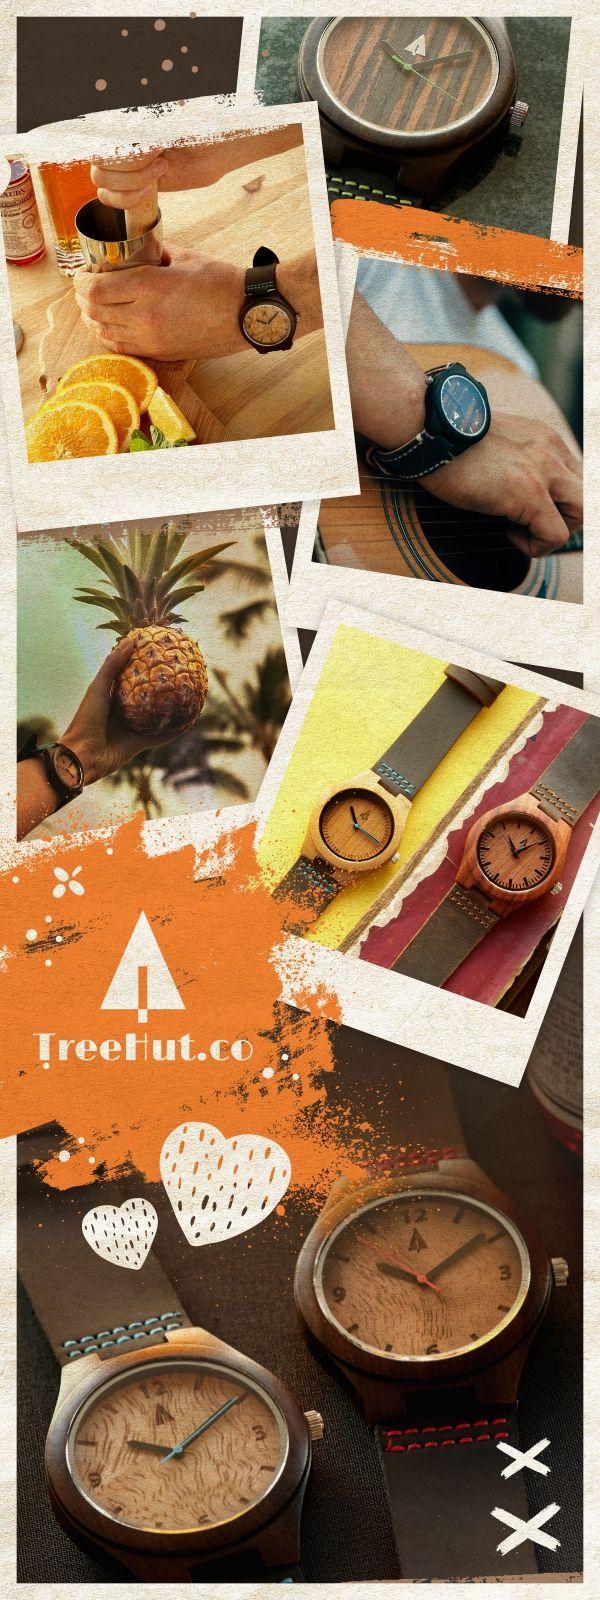 Tree Hut watches #woodwatch #wood #watch #handmade #clock #gift #treehut